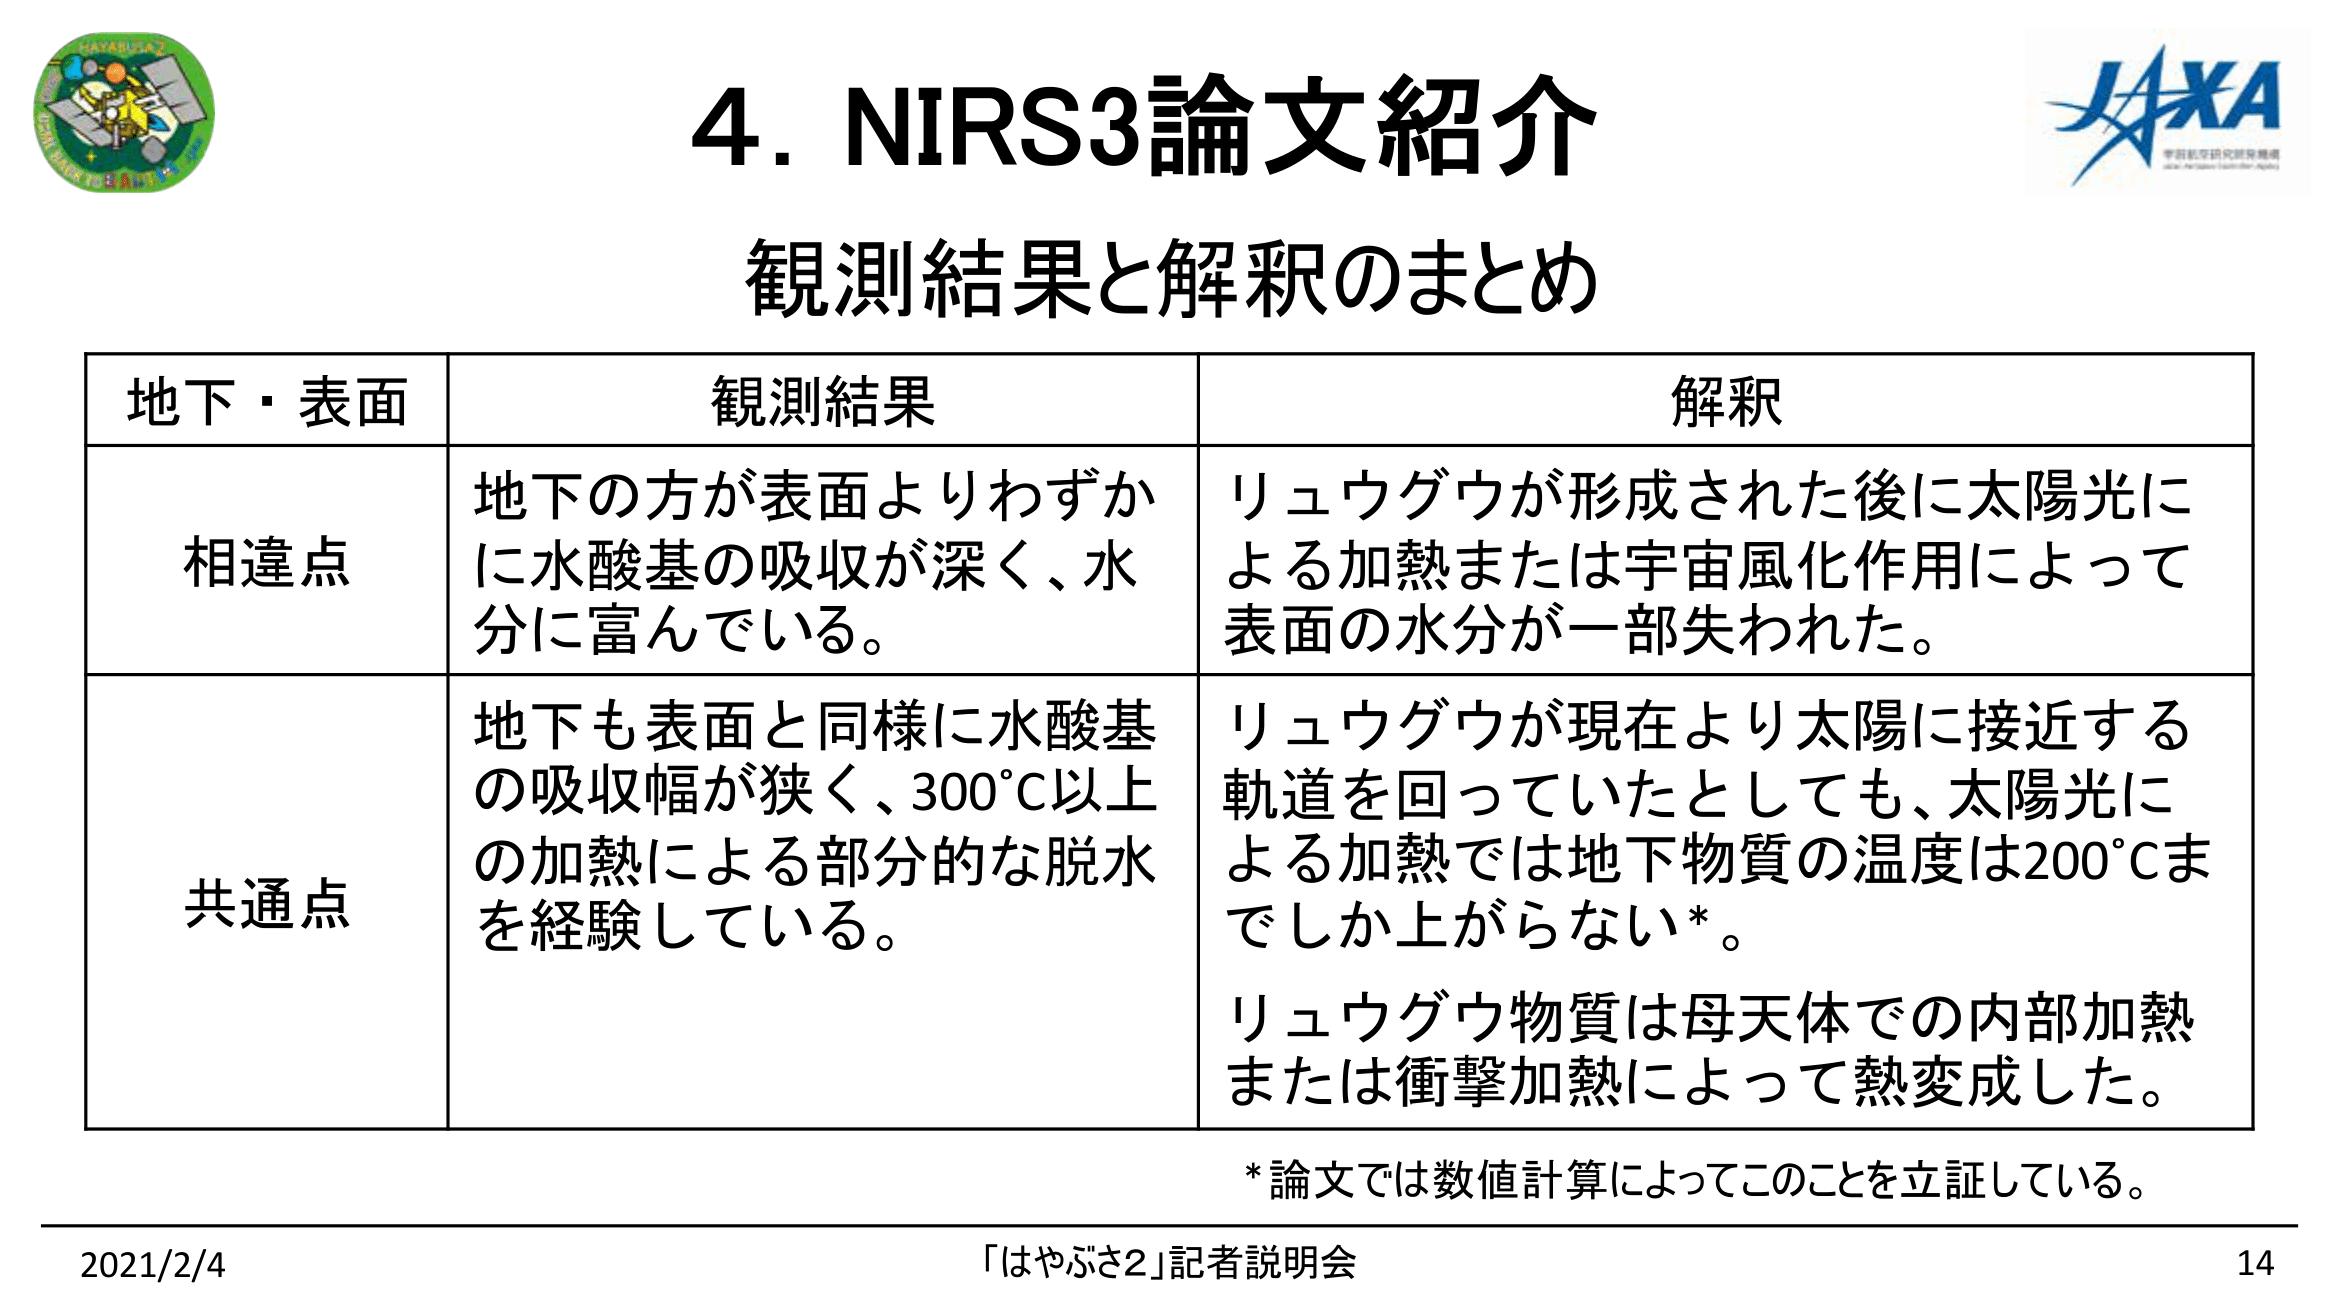 f:id:Imamura:20210204134337p:plain